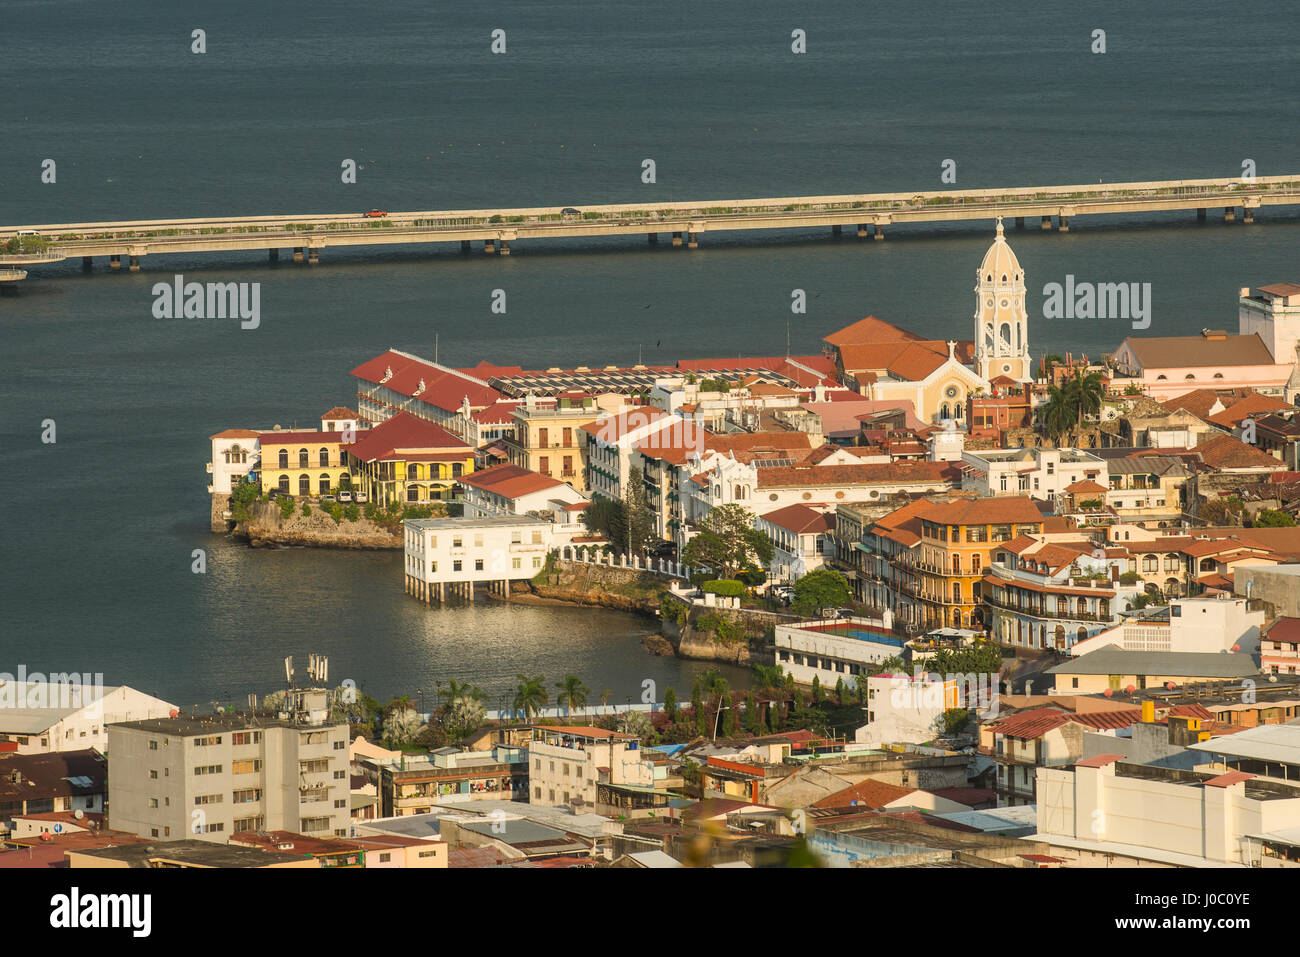 Blick über Casco Viejo, UNESCO-Weltkulturerbe, Panama City, Panama, Mittelamerika Stockbild